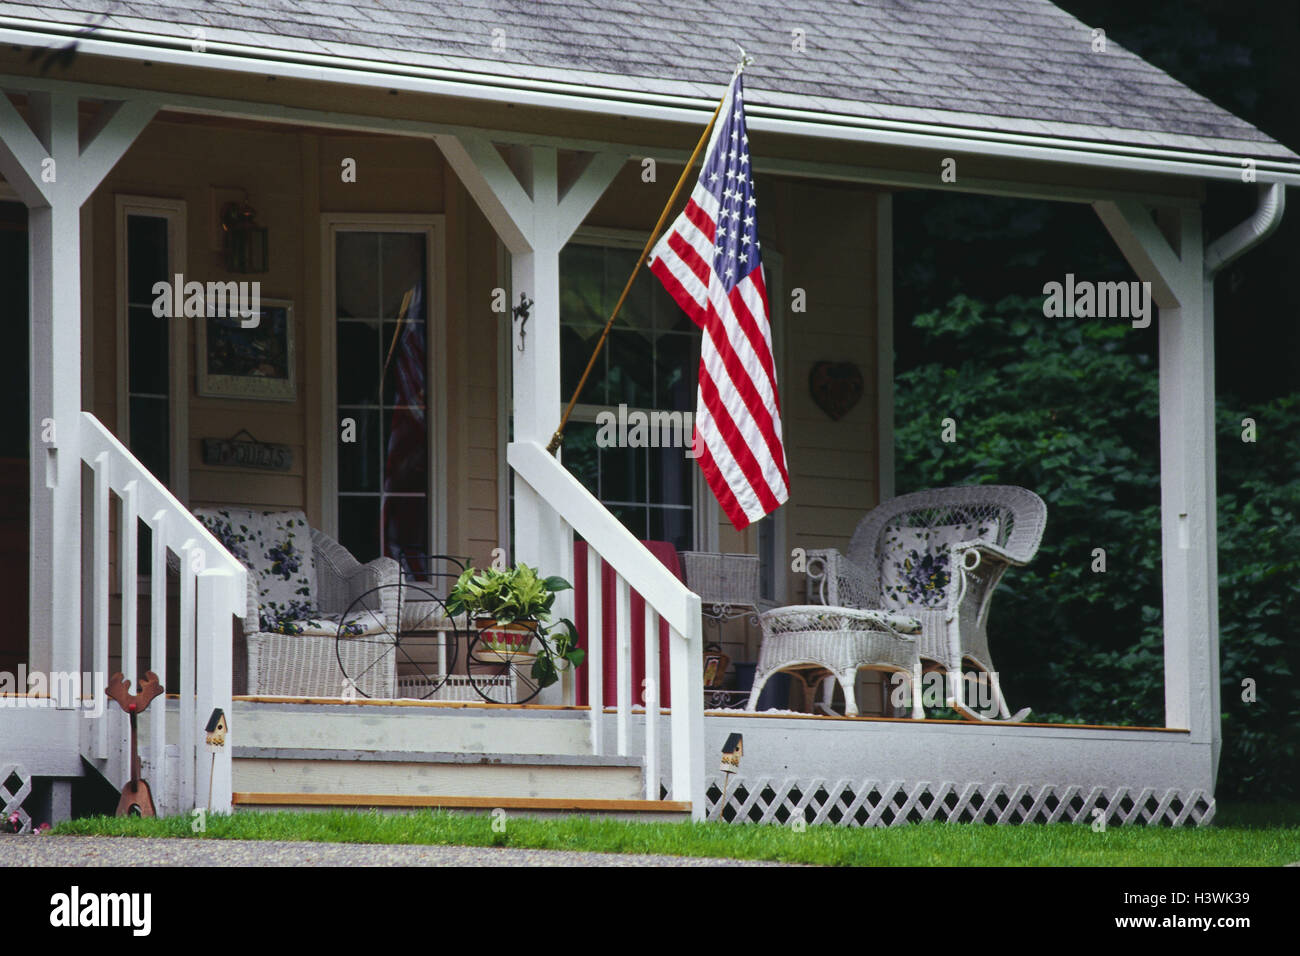 The USAu0027 Oregon, Portland, Farmeru0027s House, Veranda, Outdoor Furniture,  Wicker Piece Furniture, Flag, In American Manner, Plant, Trees, Shrubs,  Outside